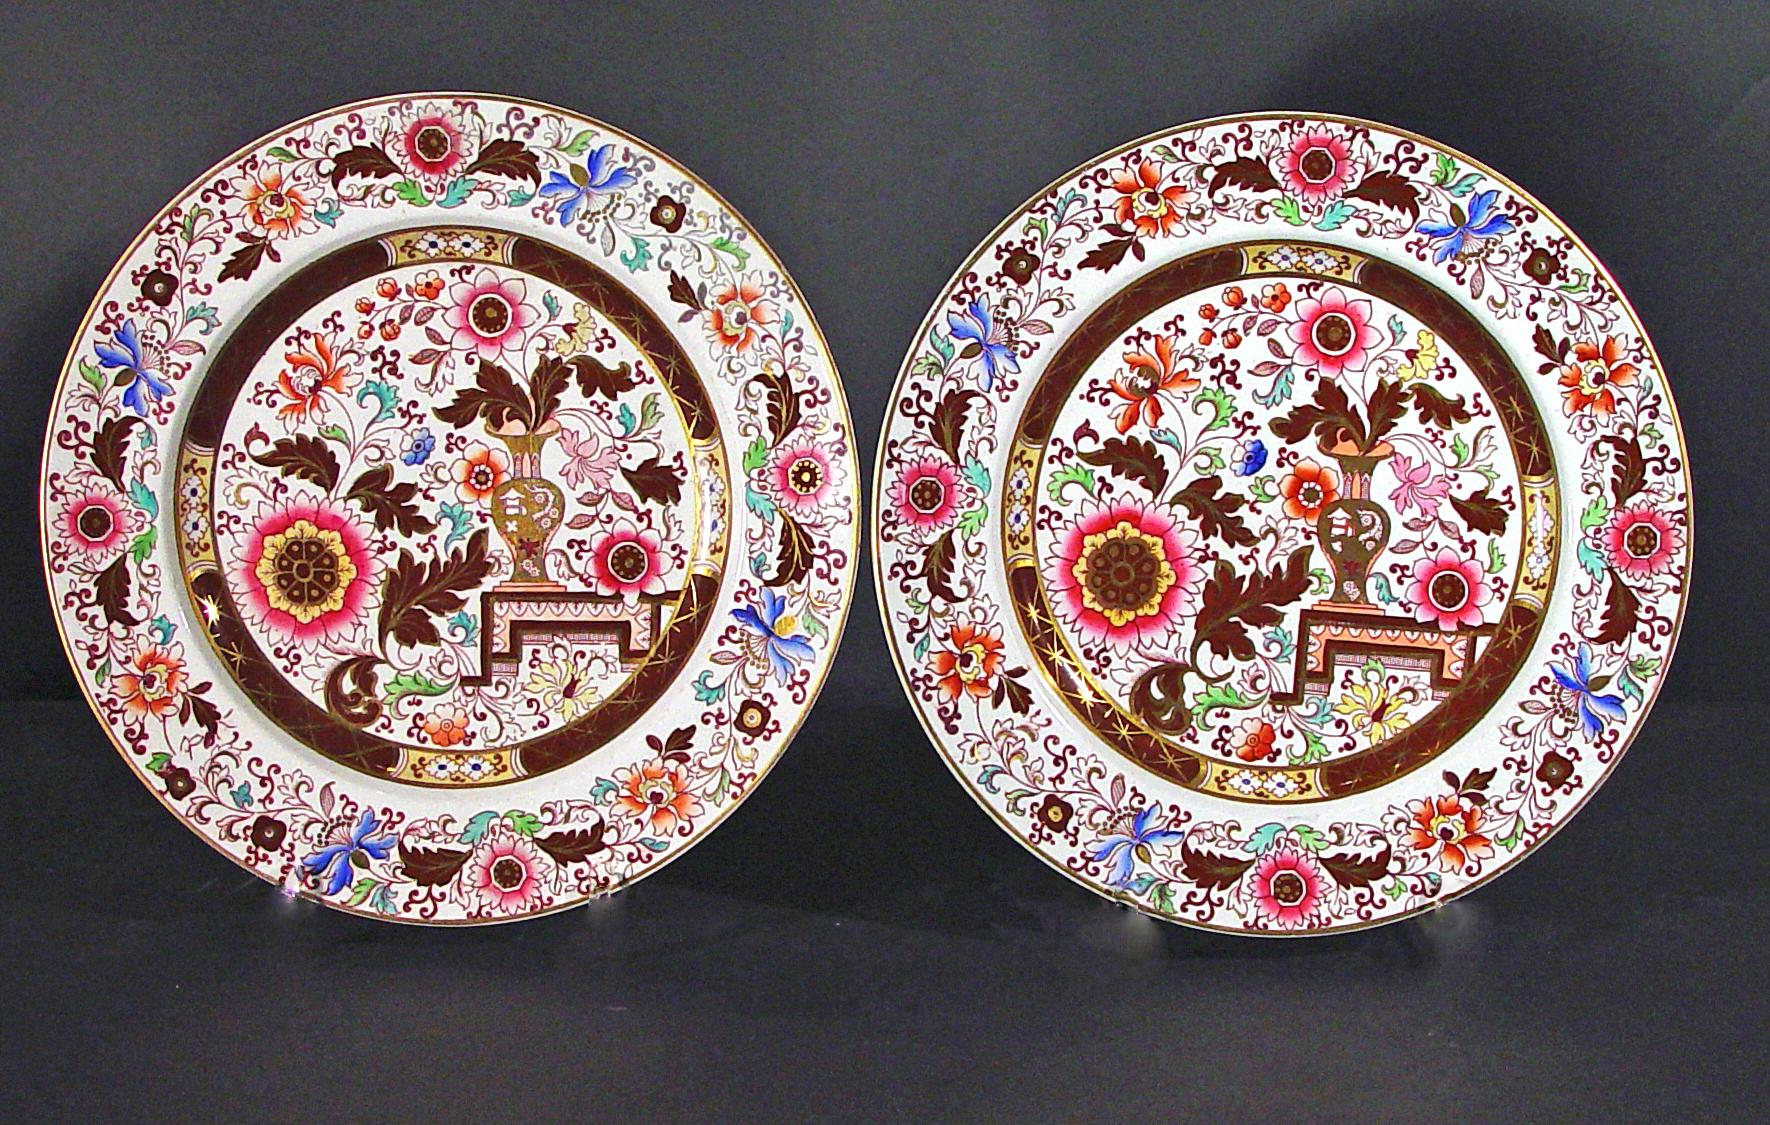 Ashworth Ironstone Large Dinner Plates - A Pair - Image 2 of 2  sc 1 st  Chairish & Ashworth Ironstone Large Dinner Plates - A Pair | Chairish